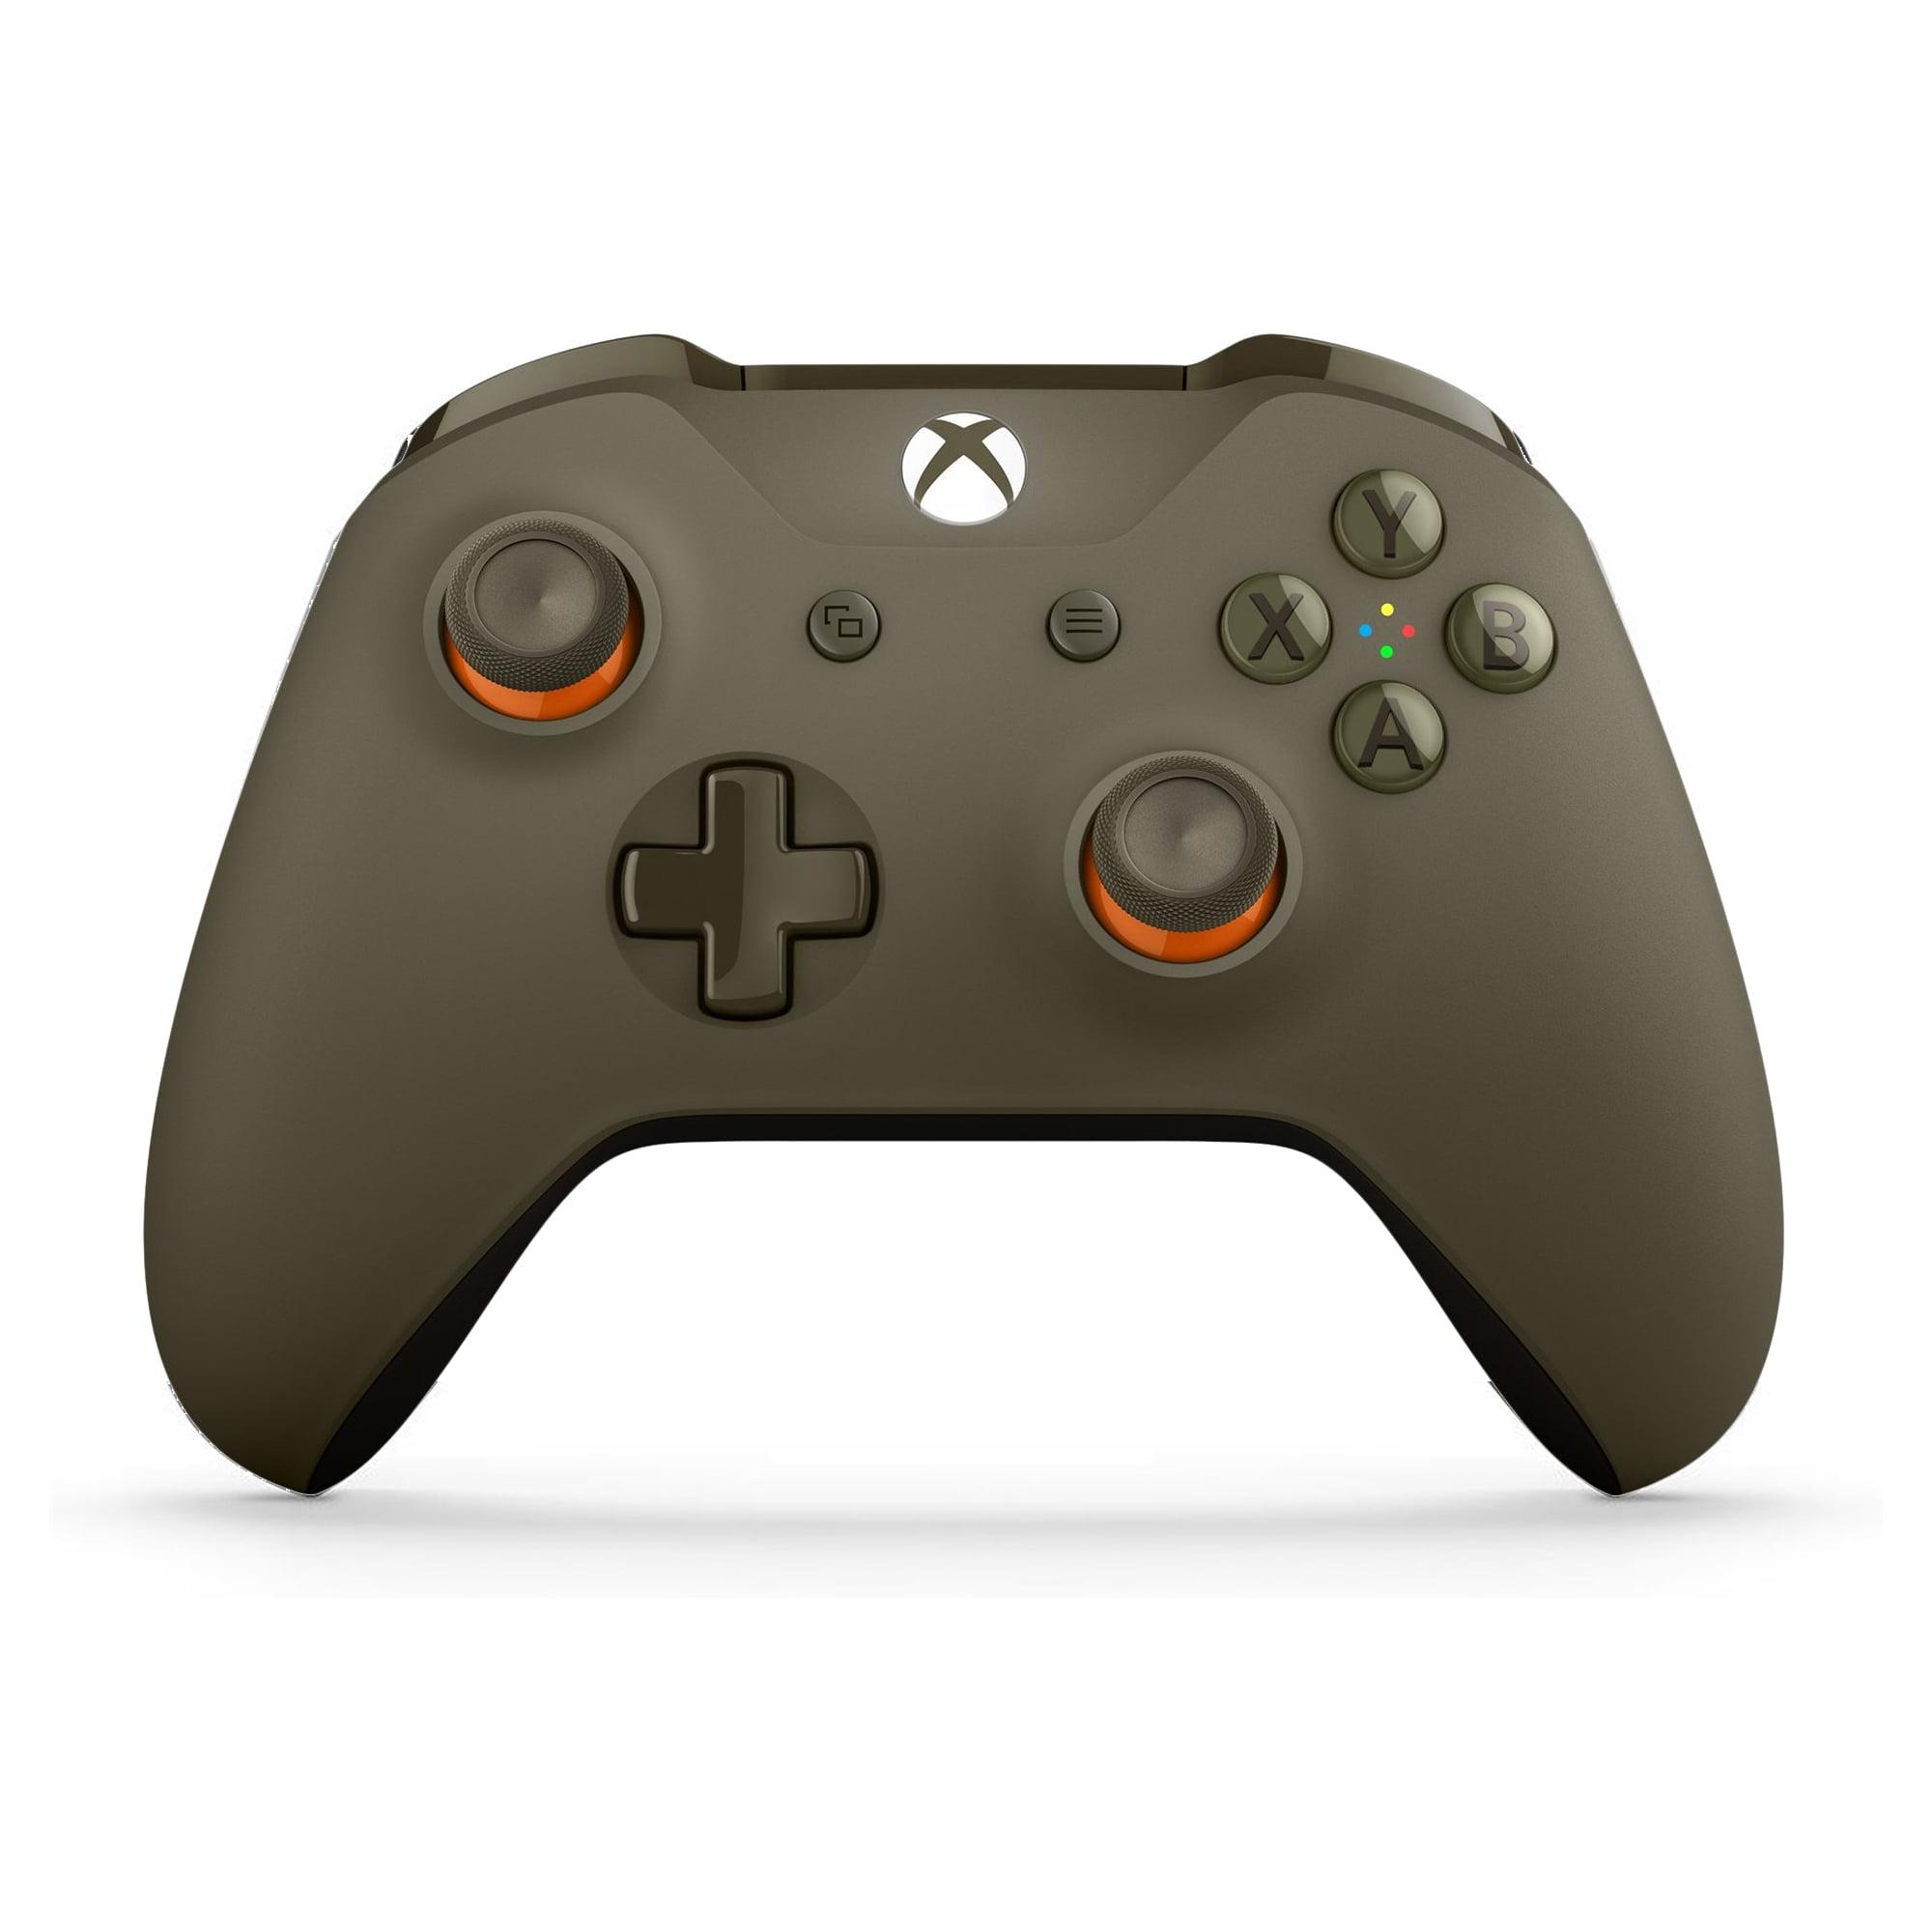 Microsoft Xbox One Bluetooth Wireless Controller, Green/Orange (Walmart Exclusive), WL3-00035